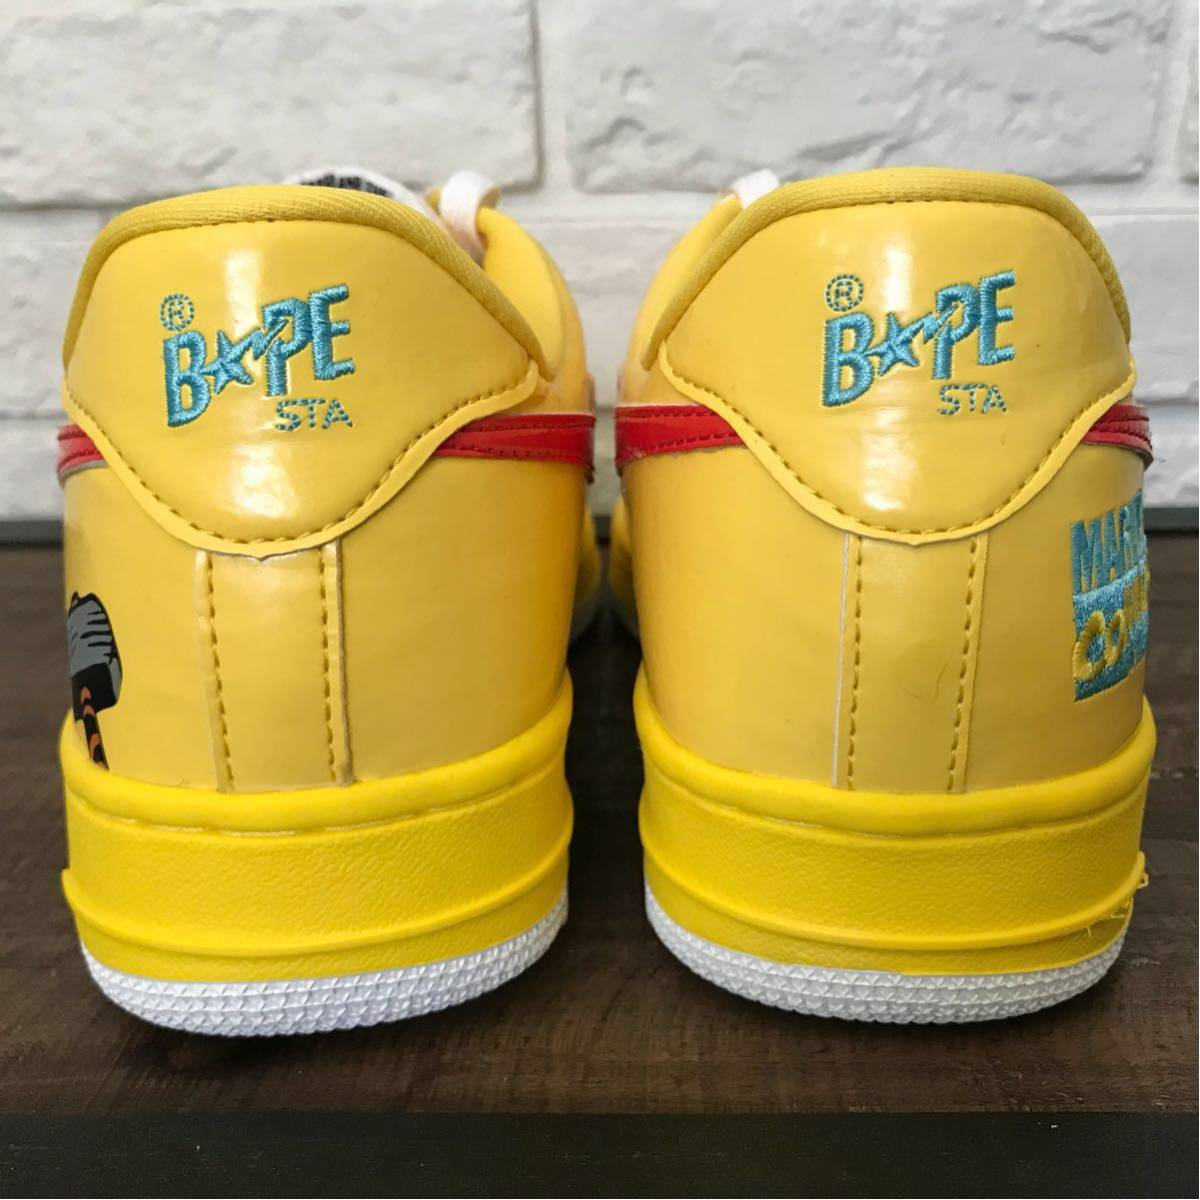 MARVEL BAPESTA THOR 27.5cm US9.5 a bathing ape BAPE STA shoes sneakers マーベル コミックス comics スニーカー エイプ ベイプ nigo